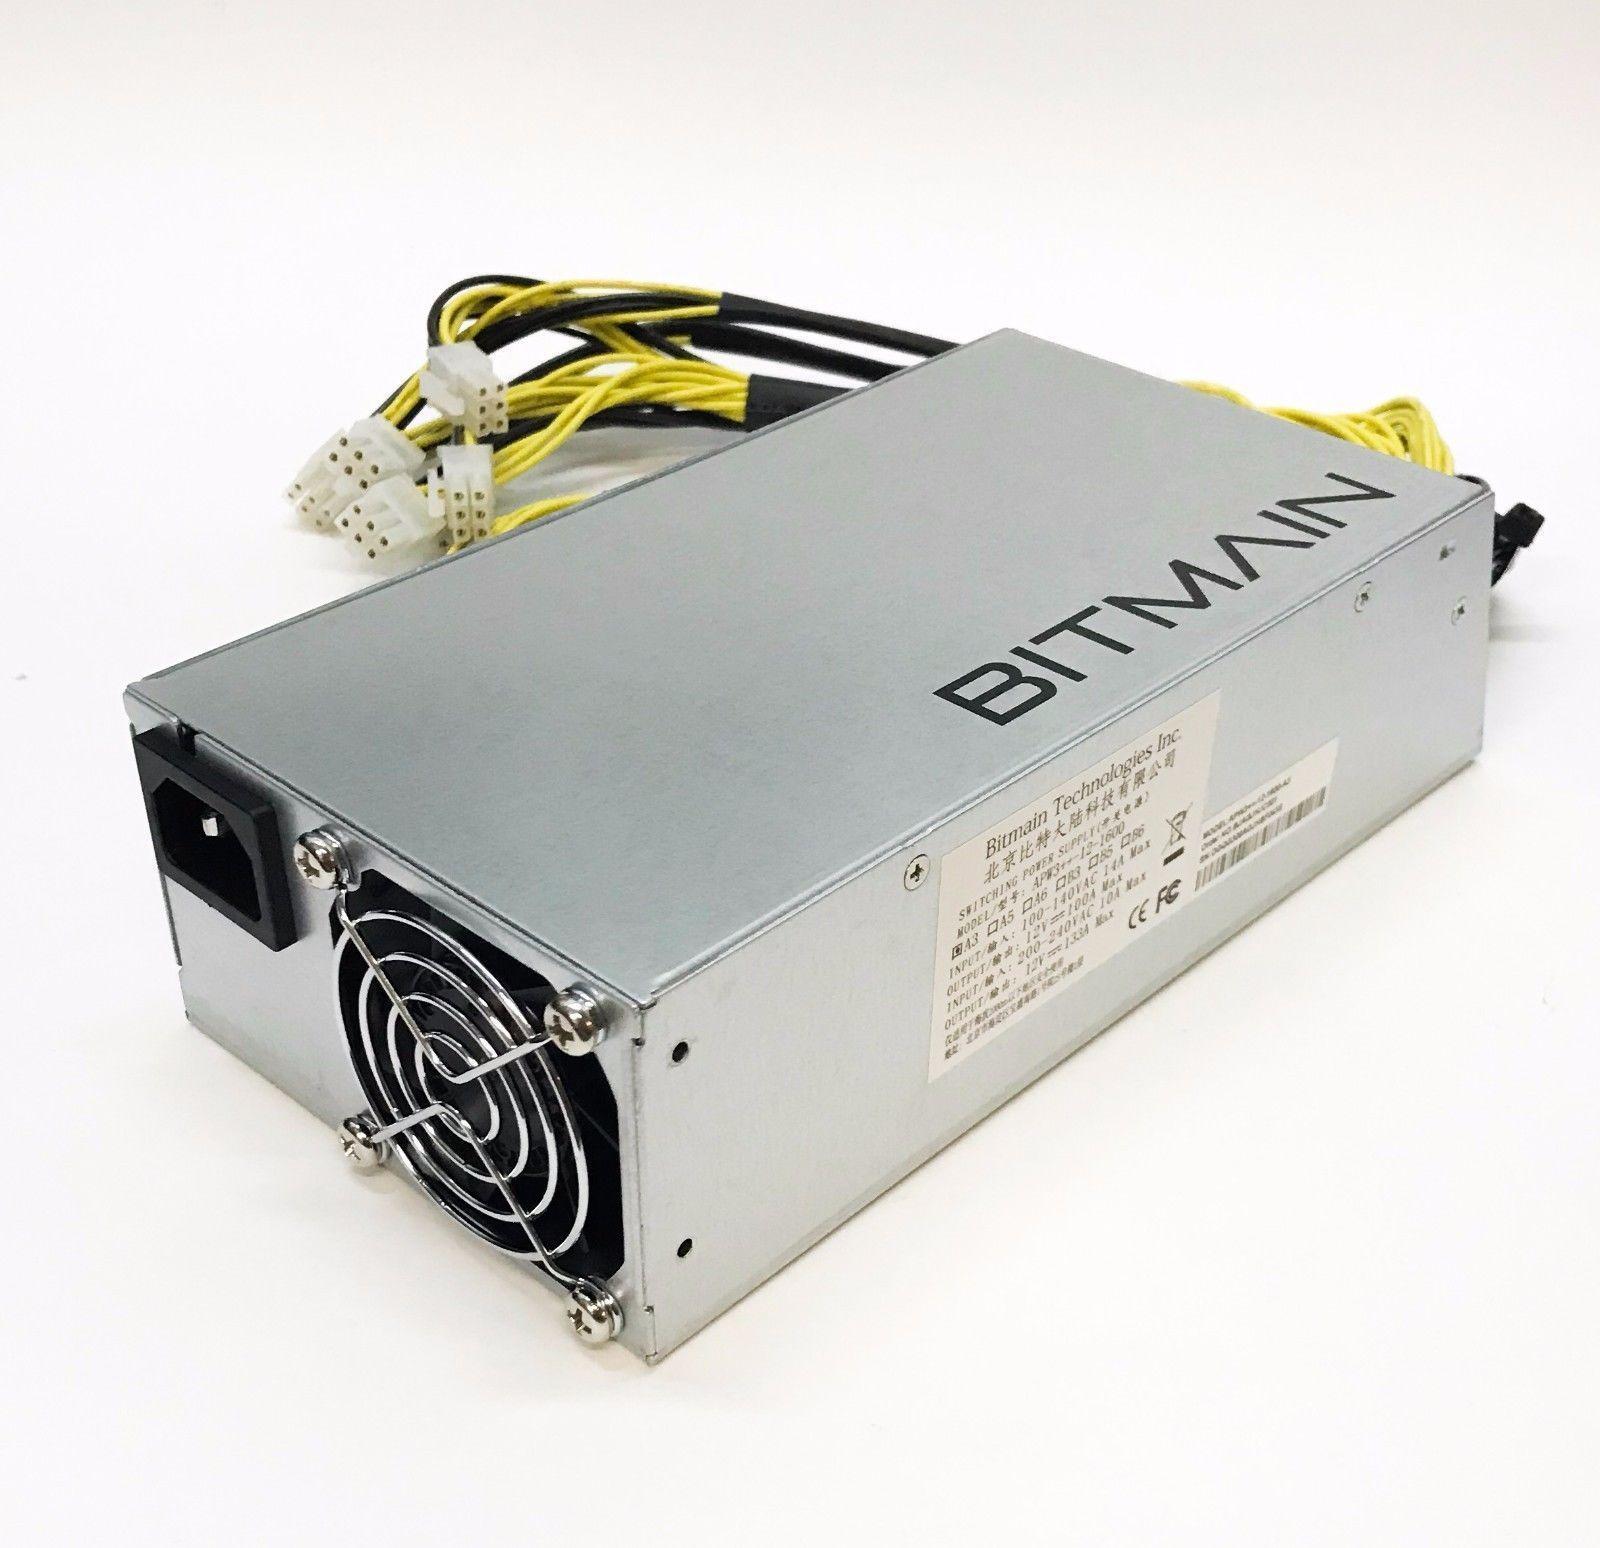 Bitmain S9 Power Supply Antminer S5 Price – Beagency Blog